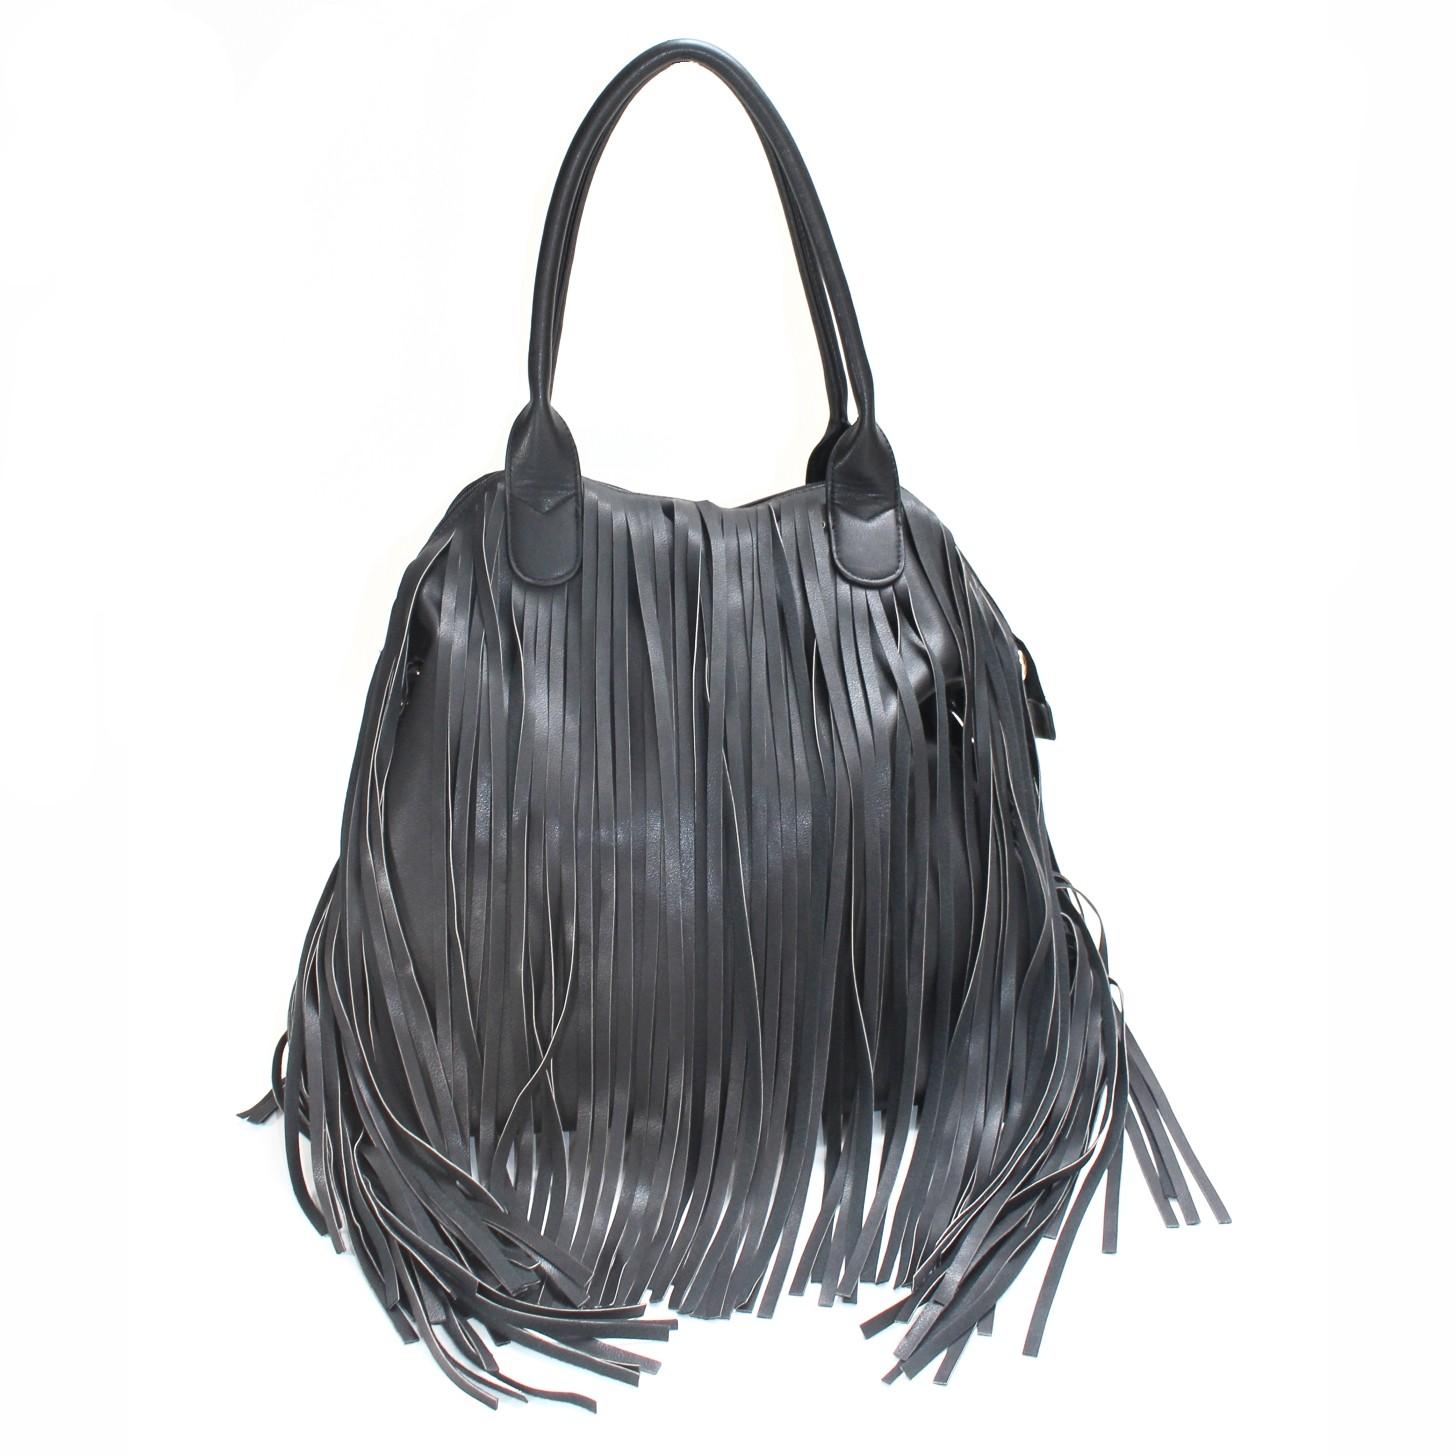 black fringe bagLazenay Fringe Bag in Black S87lBh6E